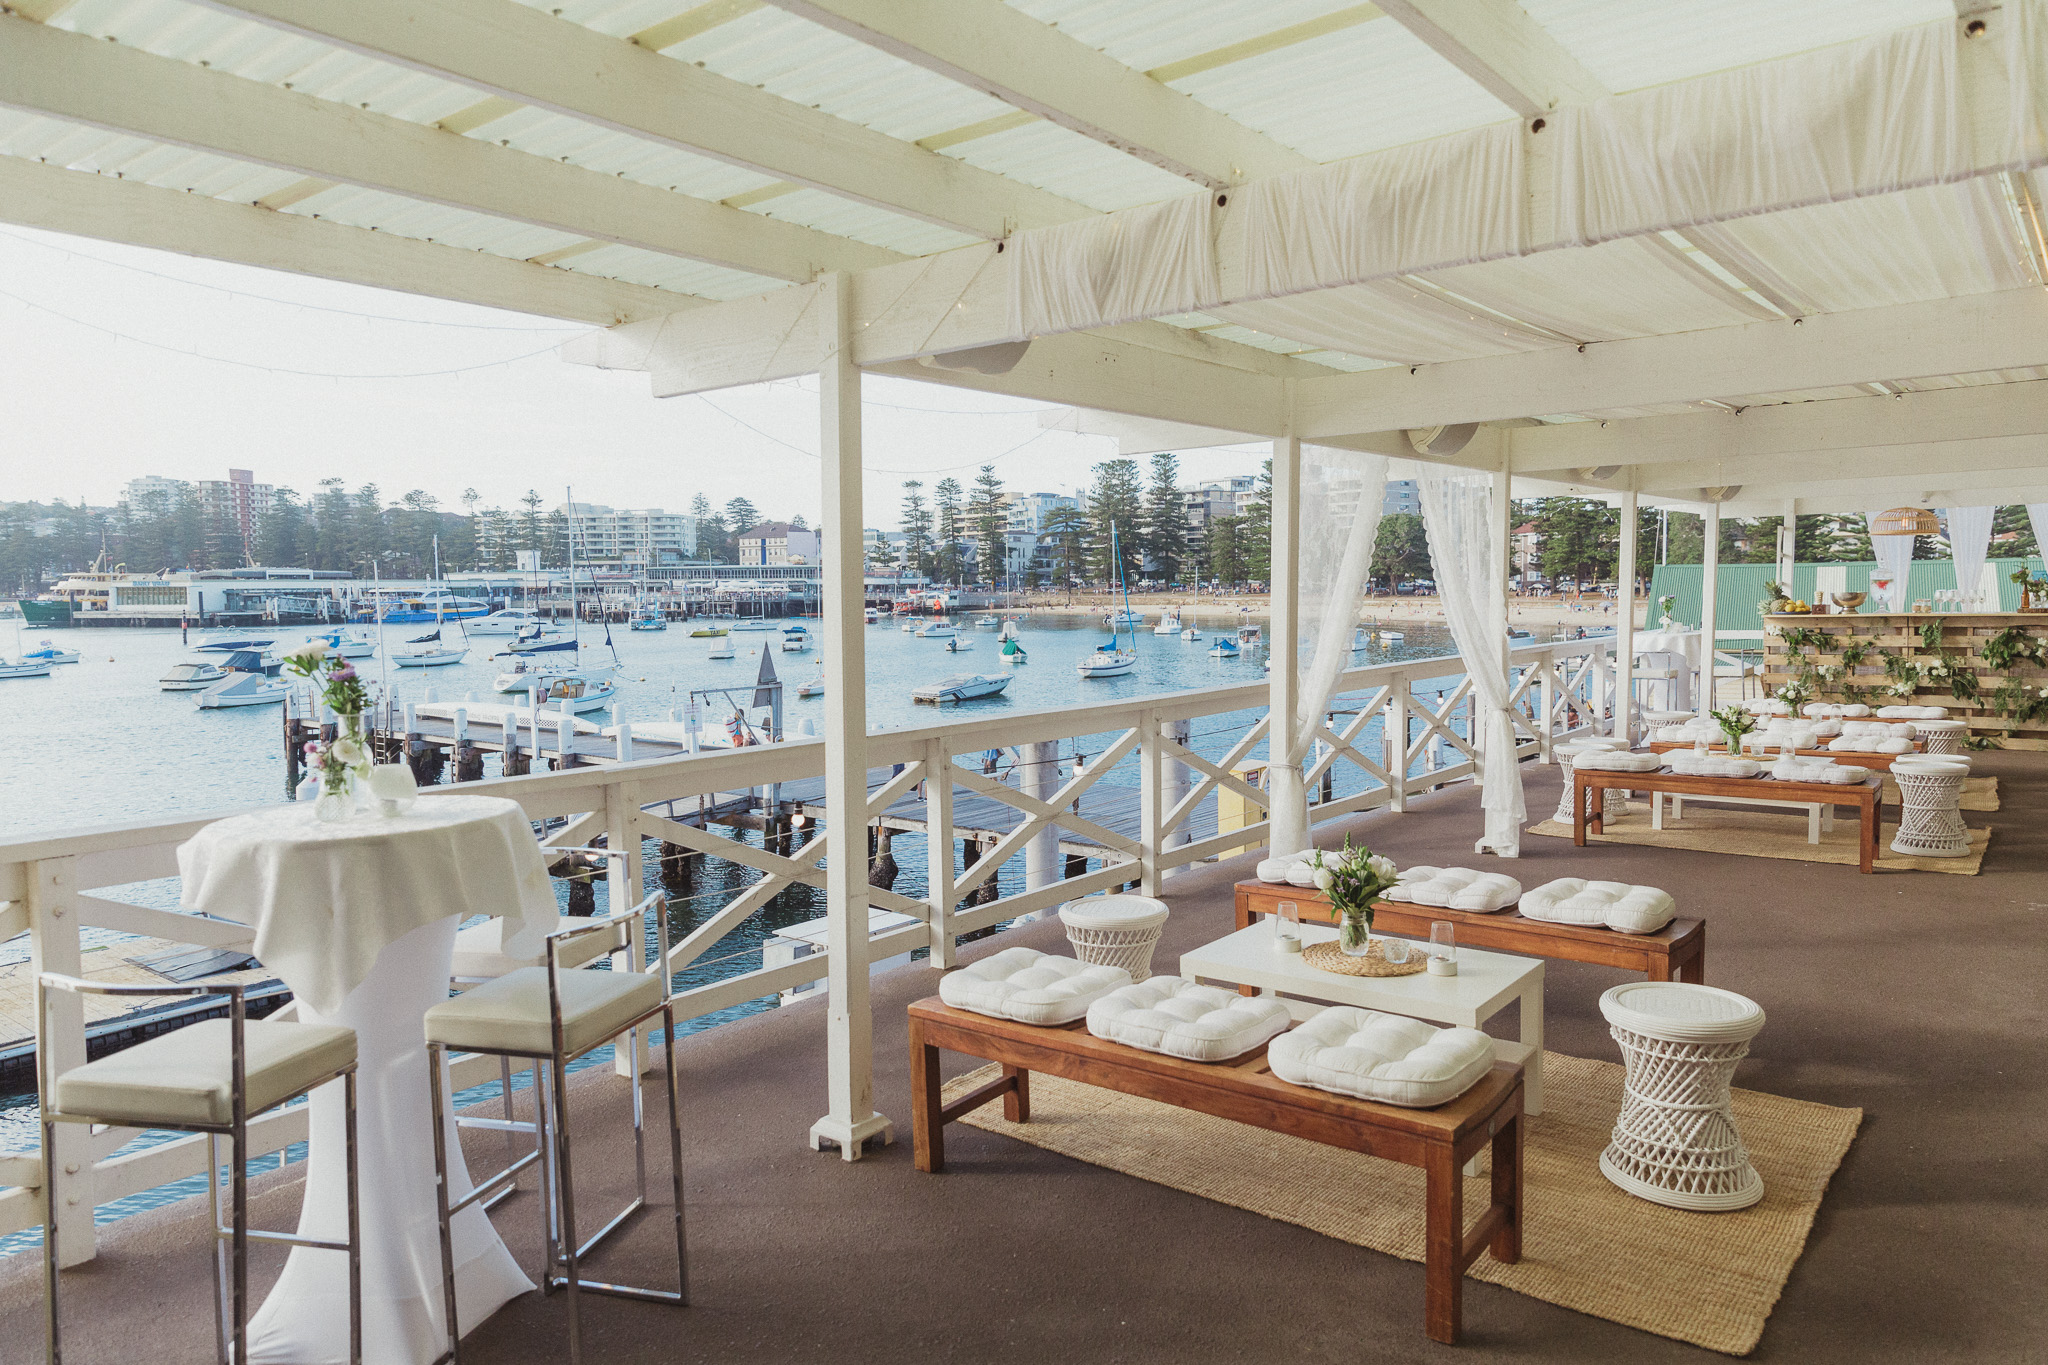 Manly_Yacht_Club_Wedding_Stylist_Northern_Beaches.jpg